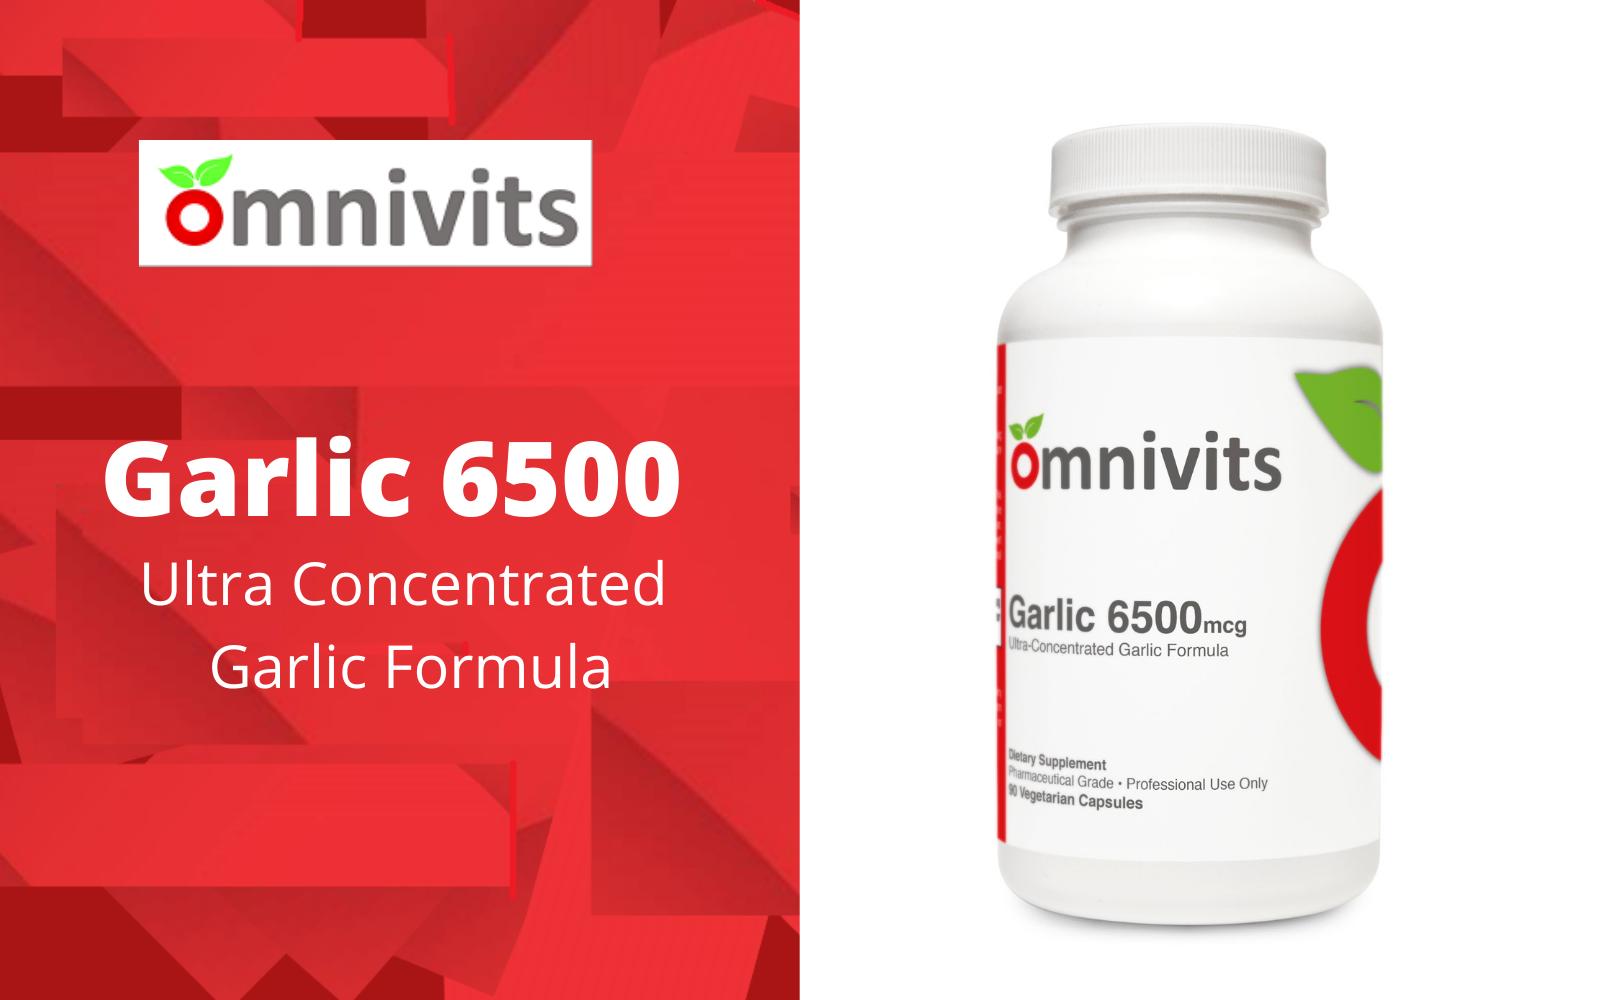 Garlic extract supplement kyolic aged garlic extract  allicillin garlinase